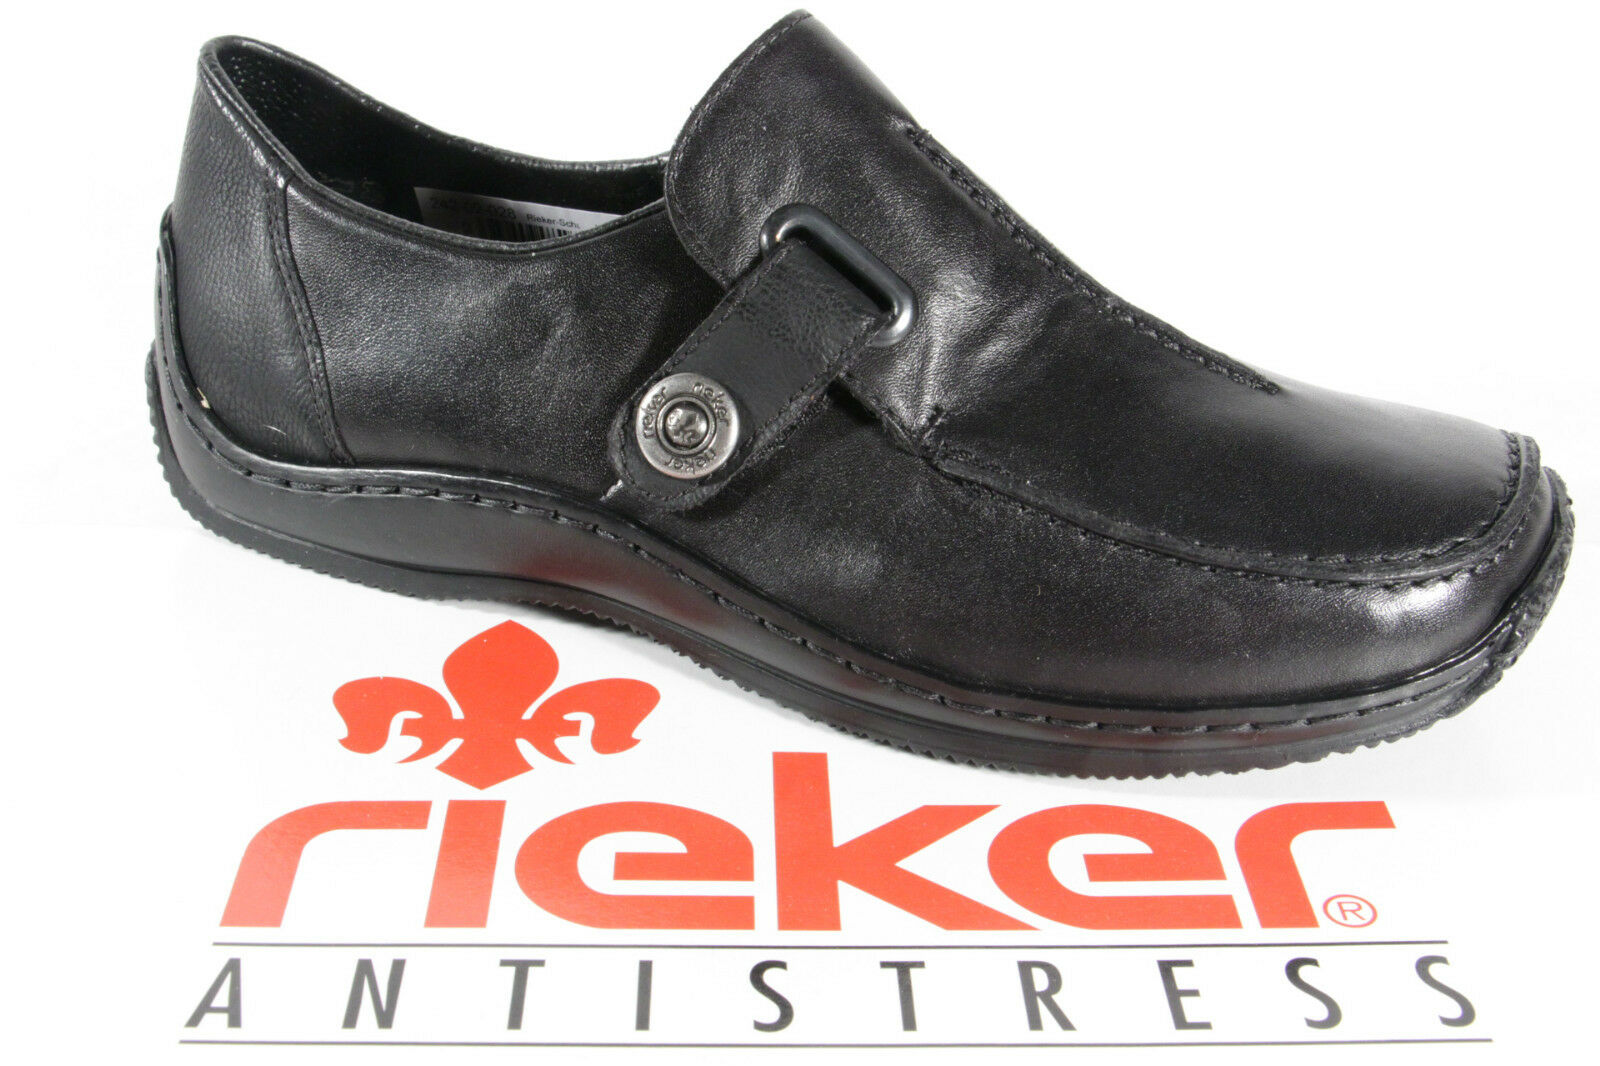 Rieker Slipper Halbschuhe Sneakers Ballerina Sportschuhe schwarz Neu Leder L1753 Neu schwarz 78bd62